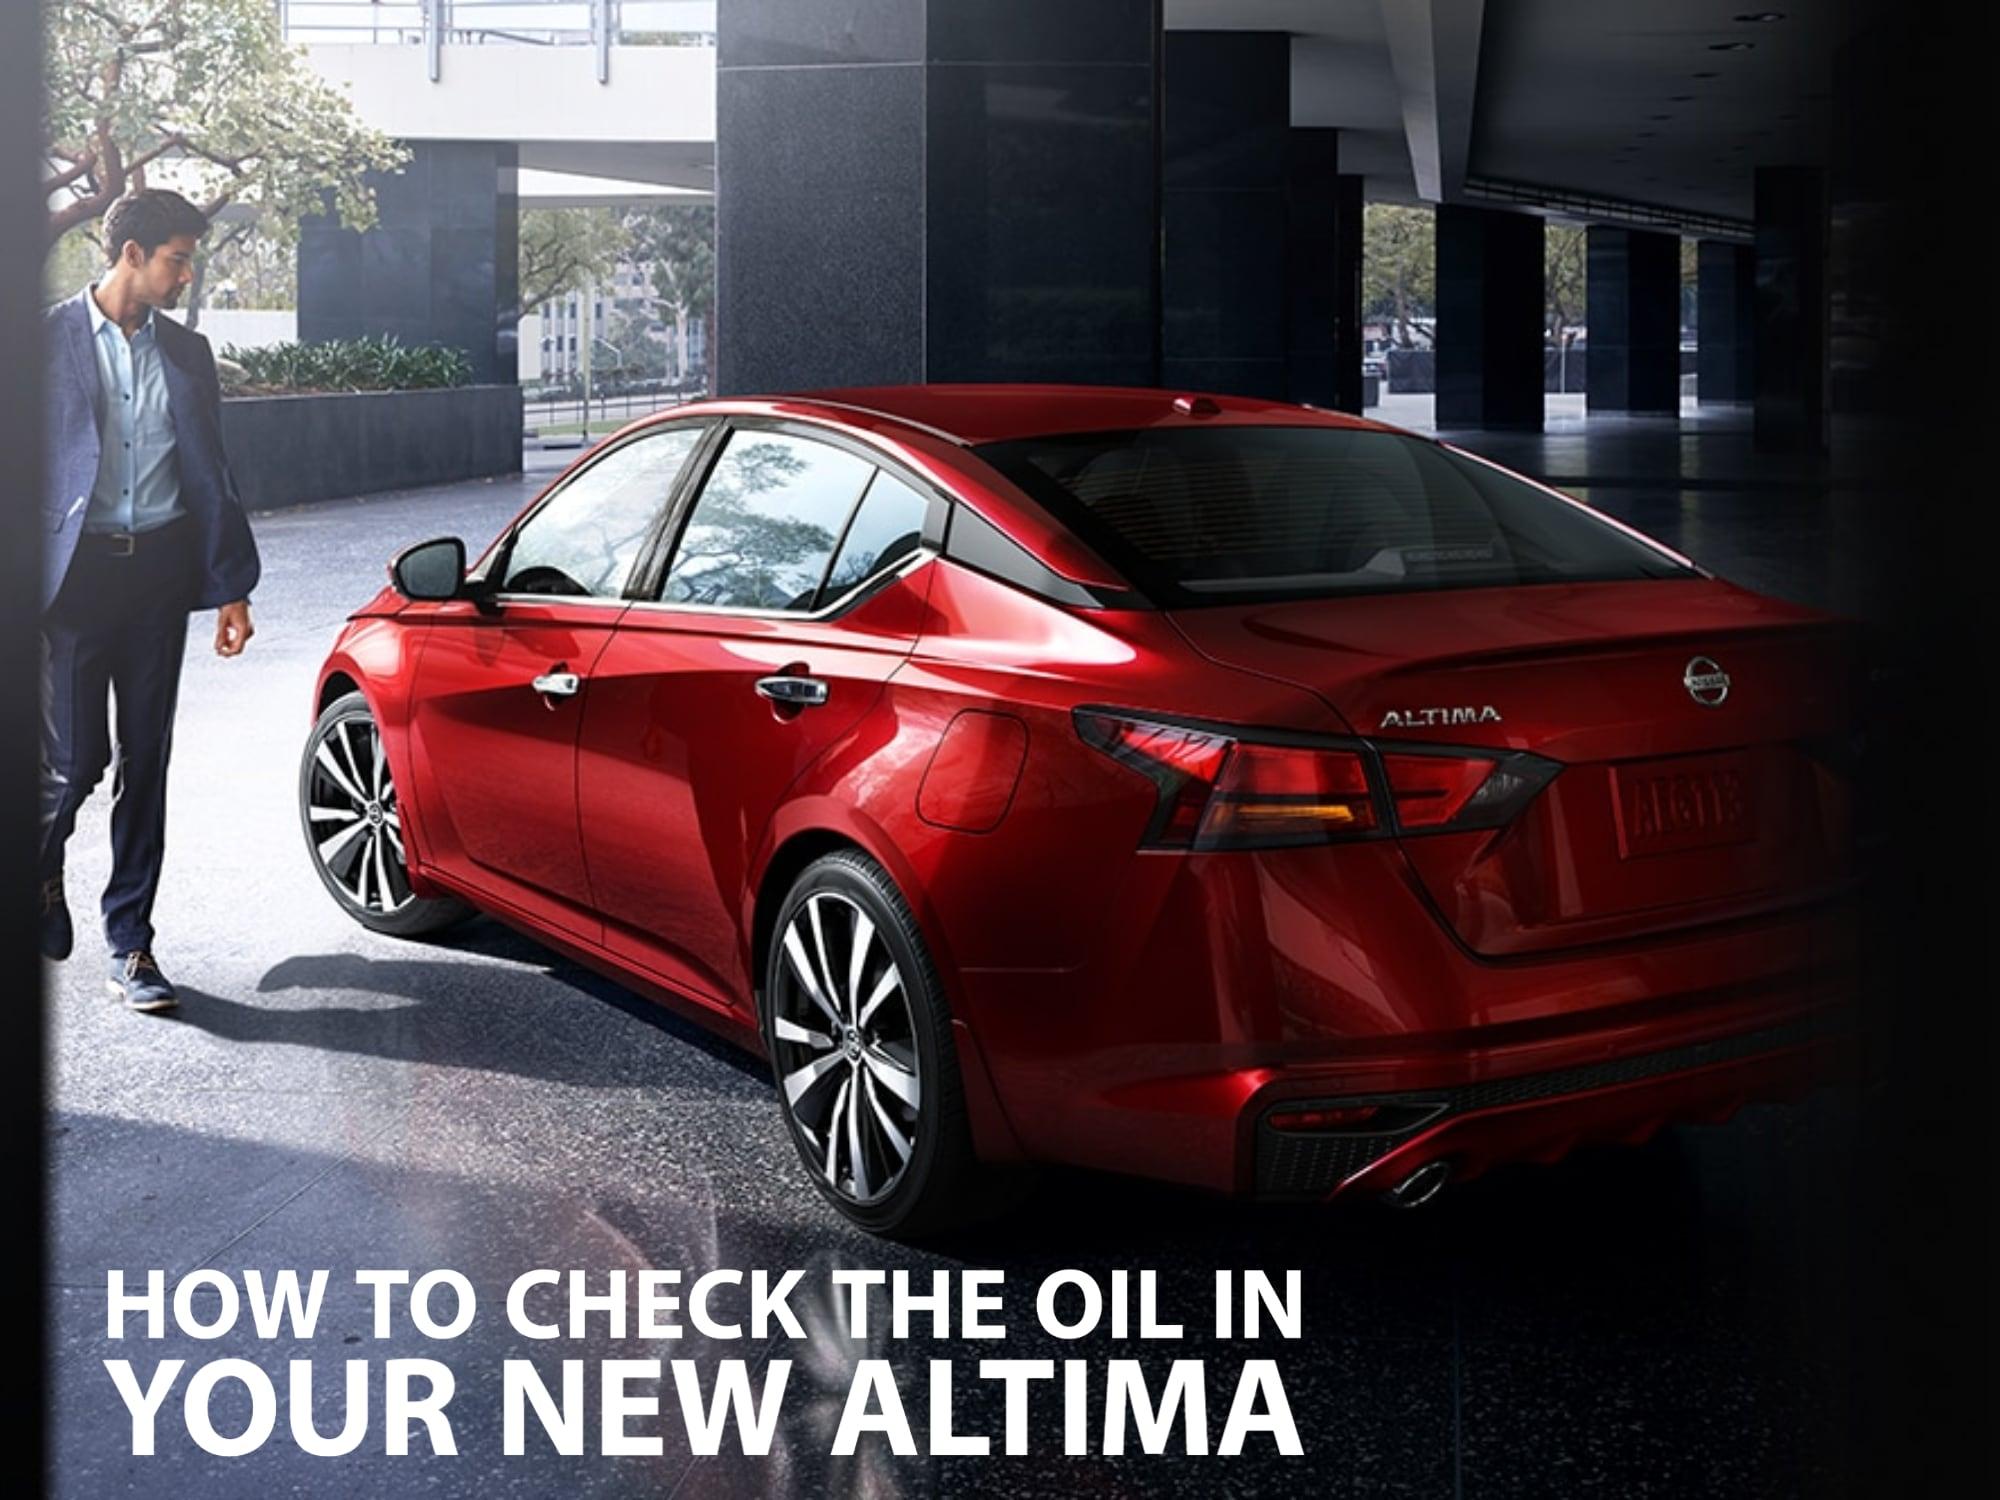 Guy walking around red Nissan Altima rear 3/4 view